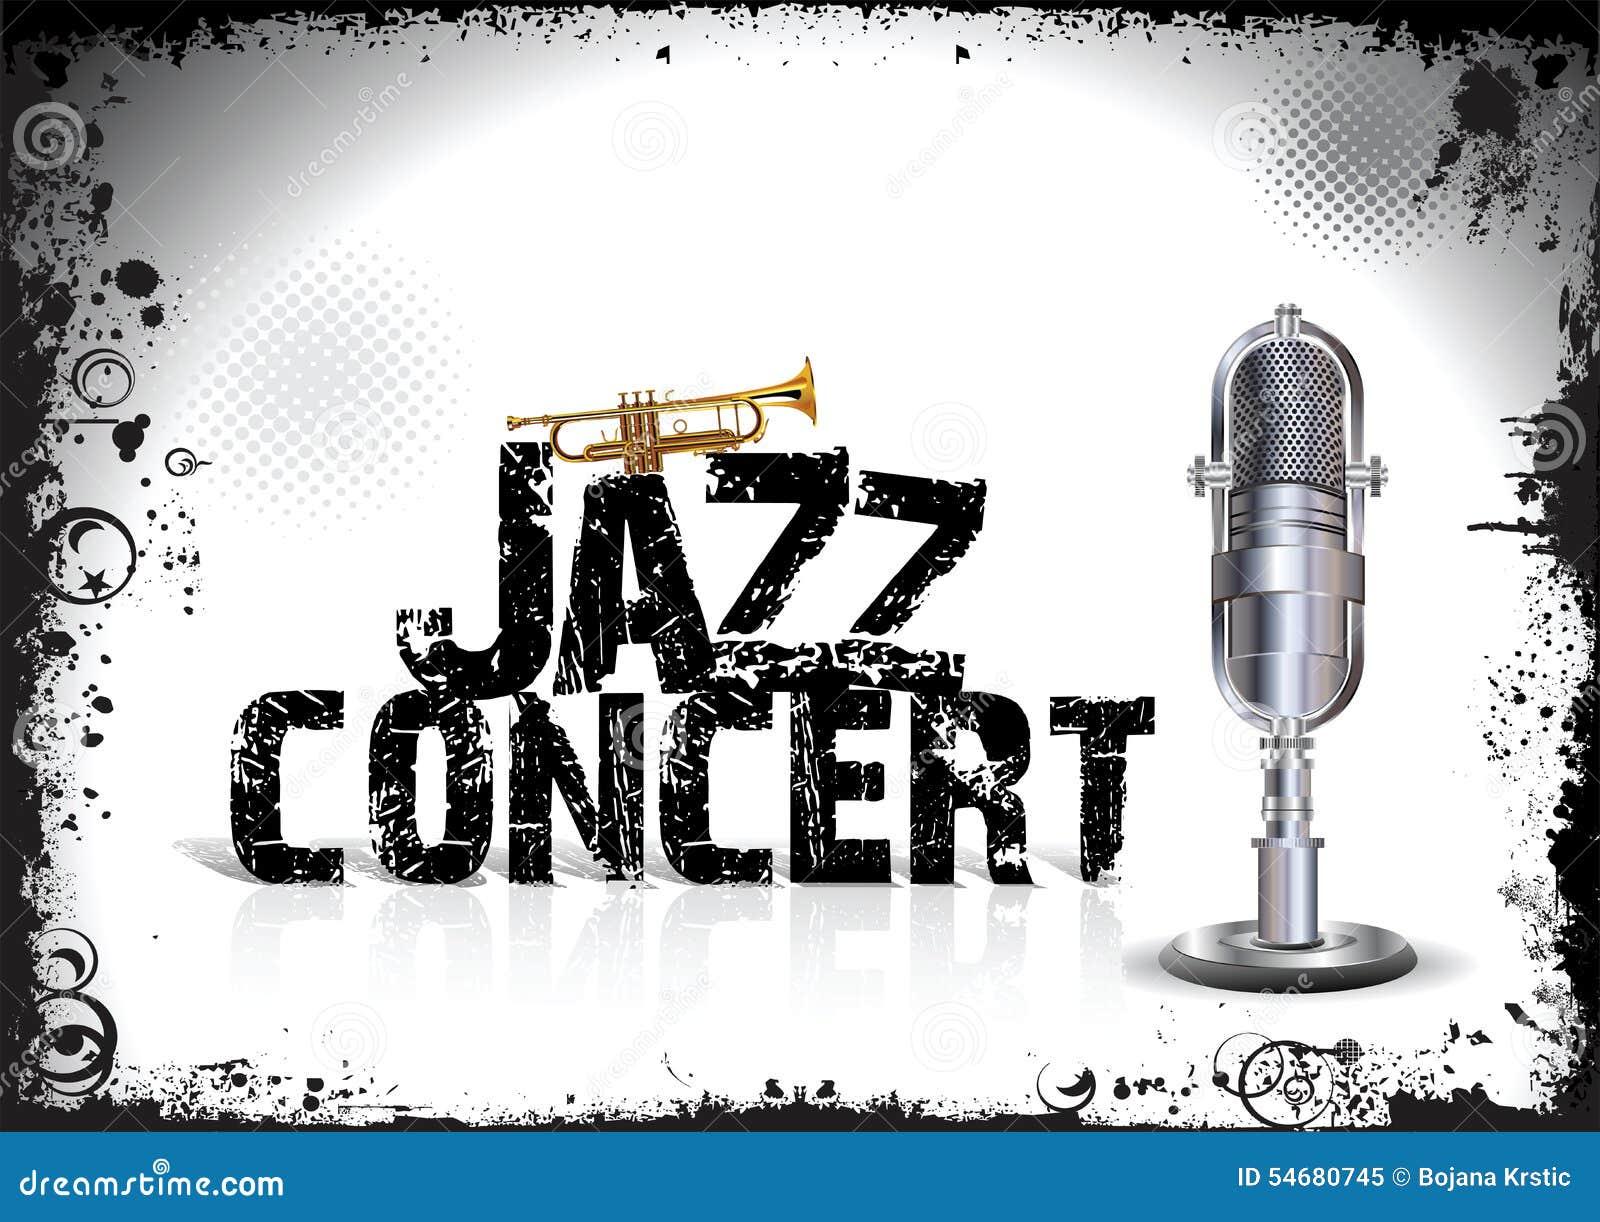 Jazz Concert Poster Stock Illustration - Image: 54680745